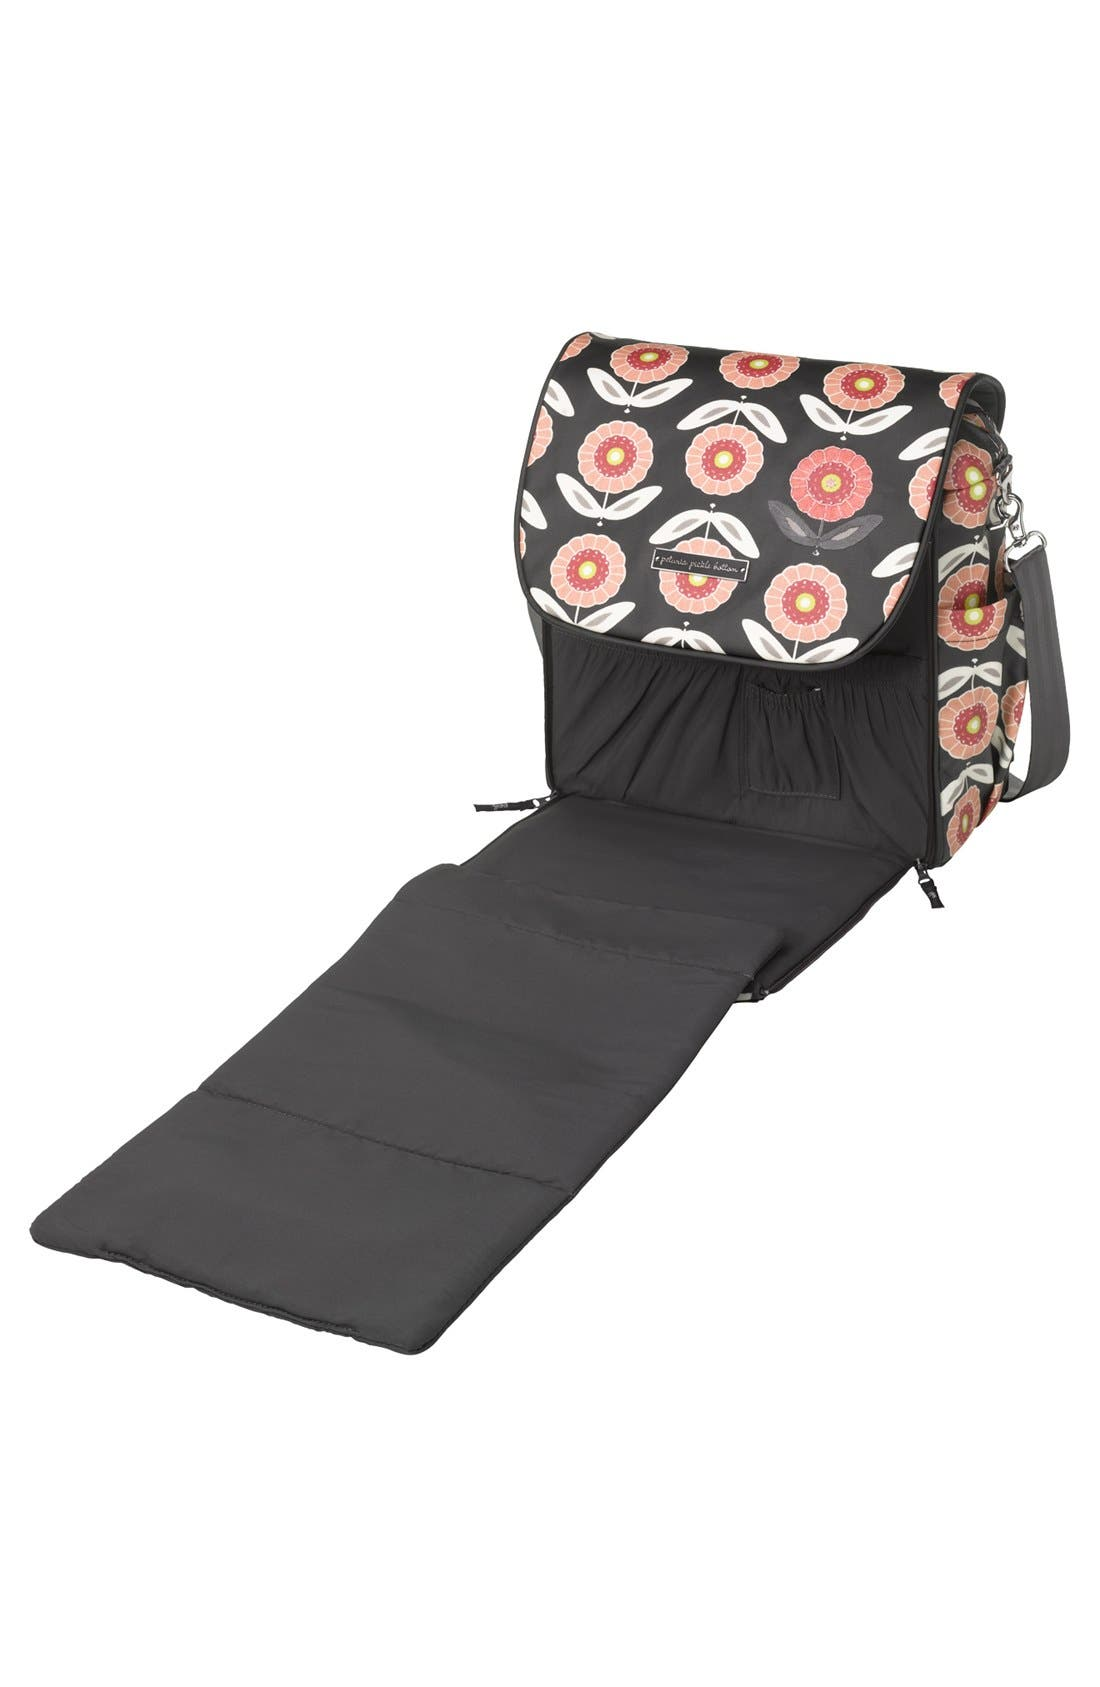 Alternate Image 2  - Petunia Pickle Bottom 'Boxy Glazed' Backpack Diaper Bag